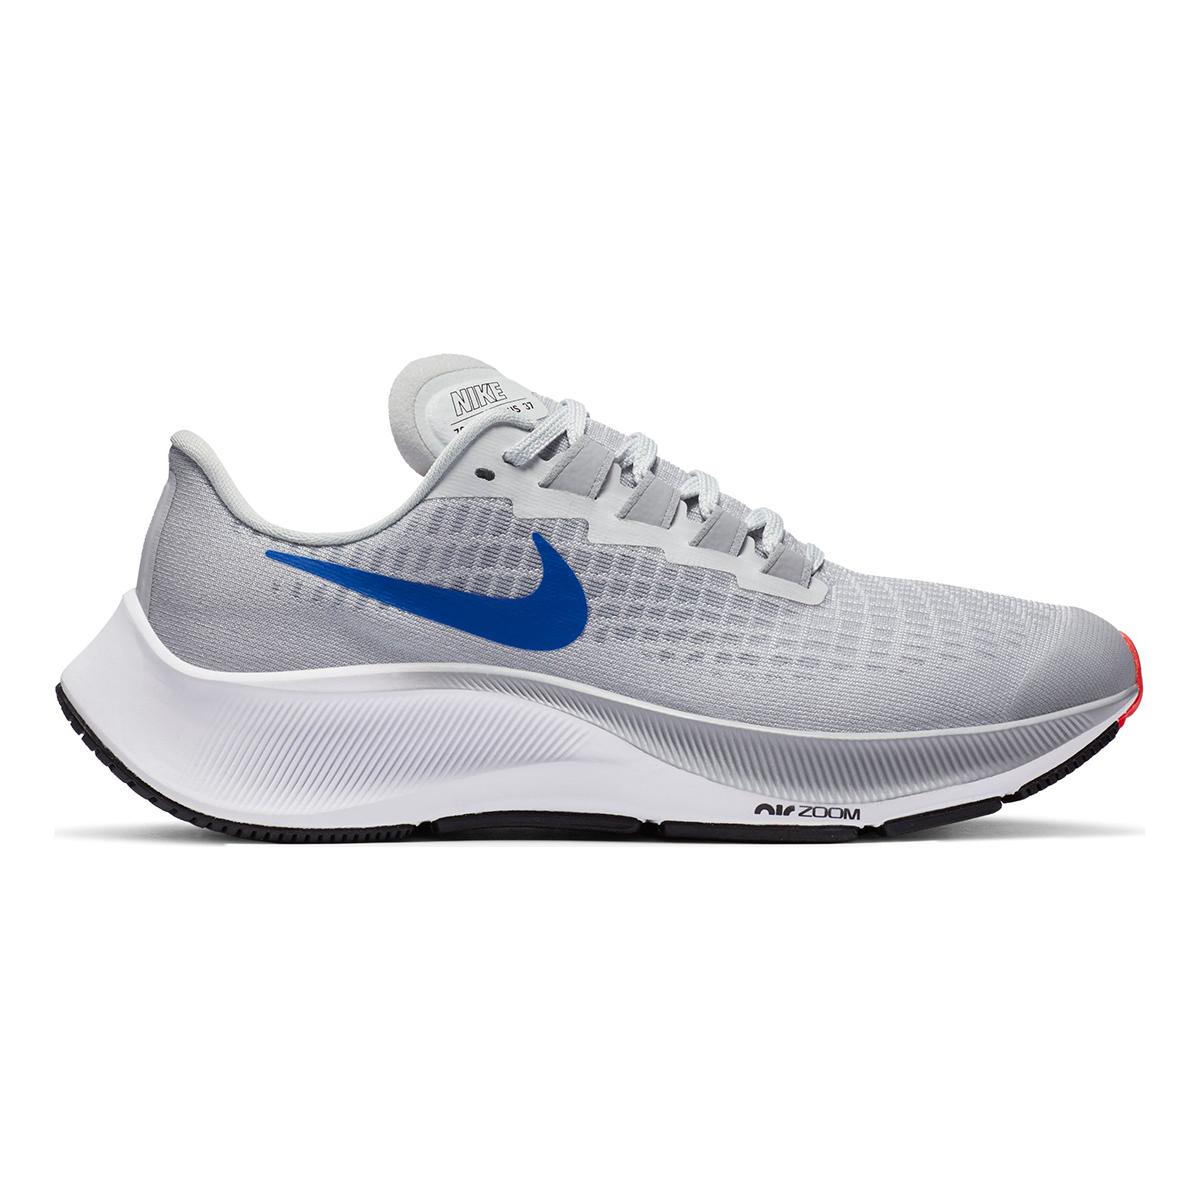 Kid's Nike Air Zoom Pegasus 37 Running Shoe - Color: Pure Platinum/Wolf Grey/Bright Crimson/Racer Blue - Size: 1 - Width: Regular, Pure Platinum/Wolf Grey/Bright Crimson/Racer Blue, large, image 1